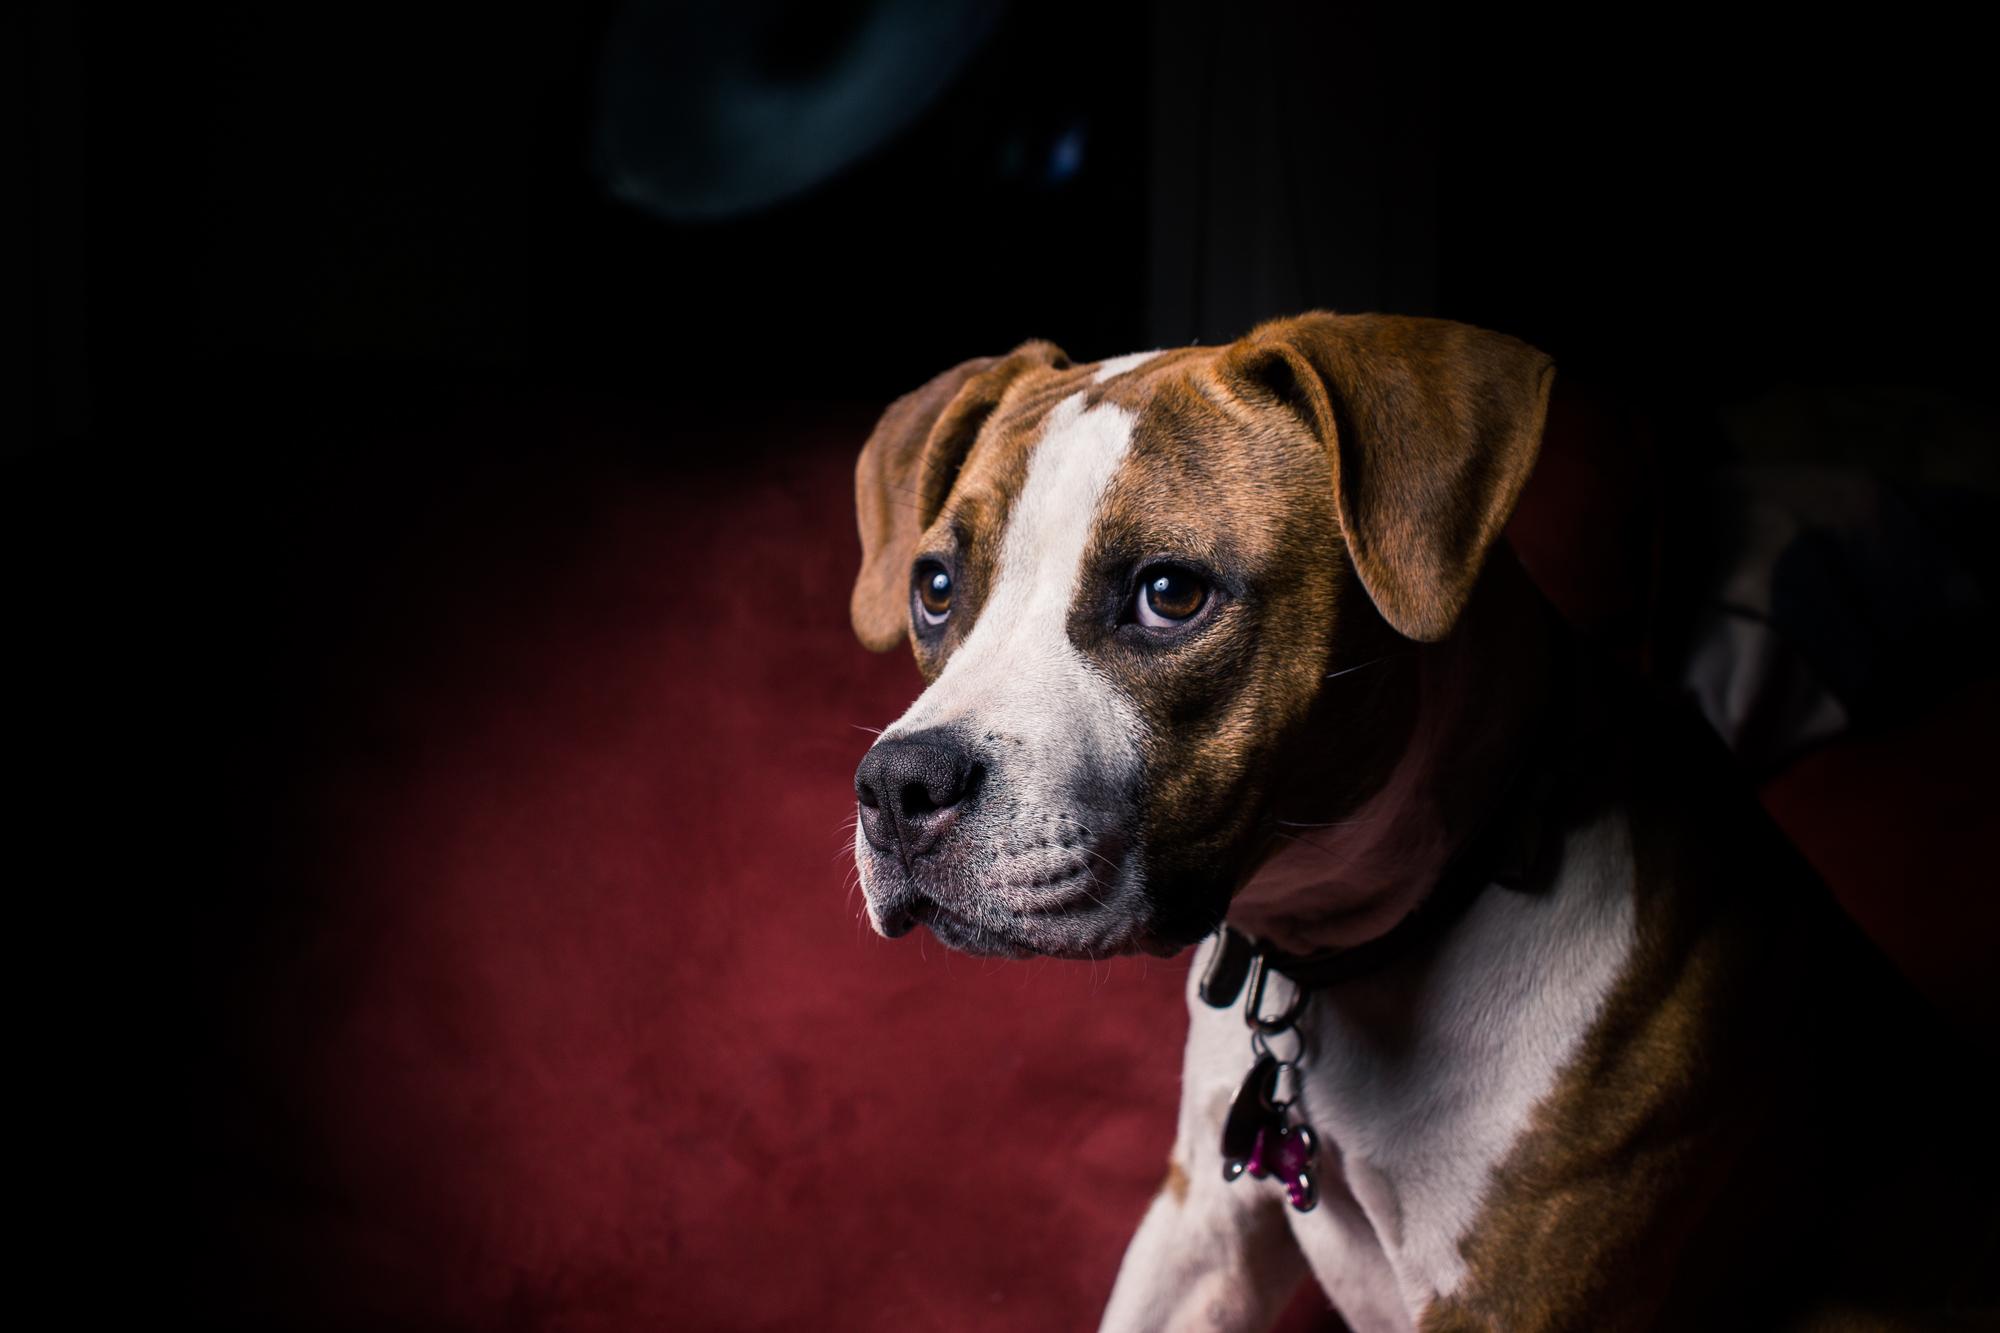 Pet Portraits - Puppy